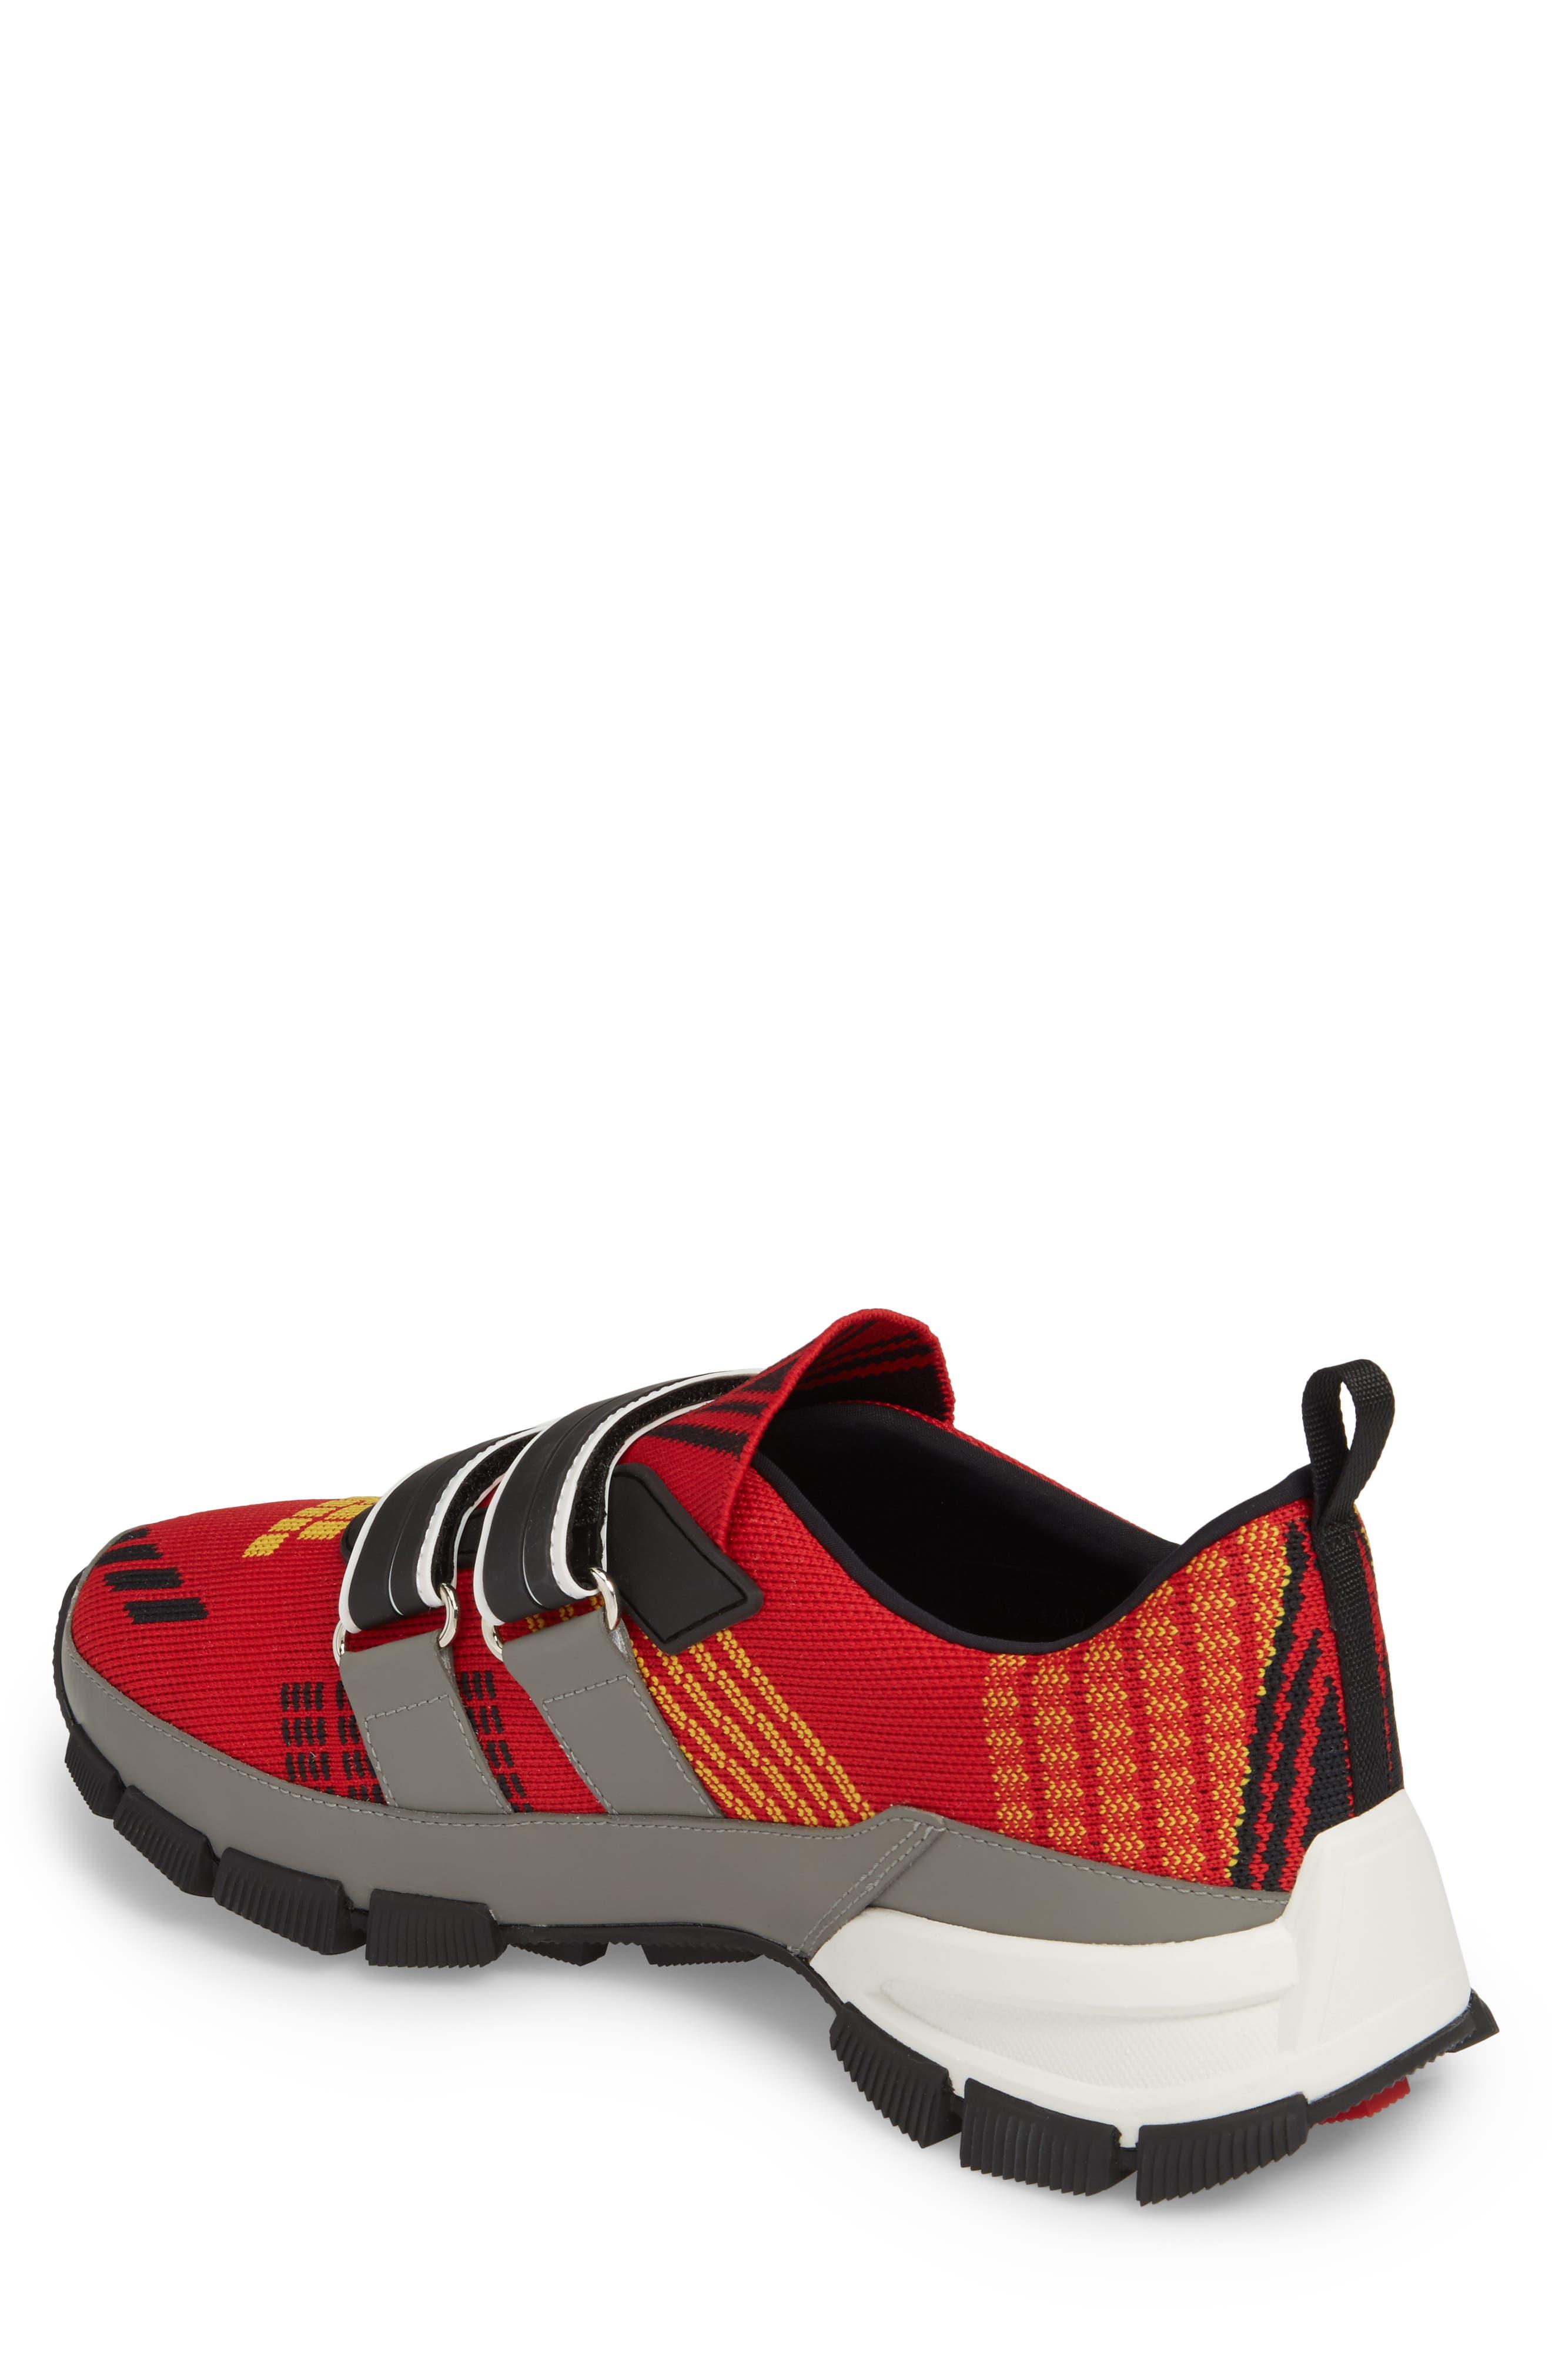 Linea Rossa Strap Sneaker,                             Alternate thumbnail 4, color,